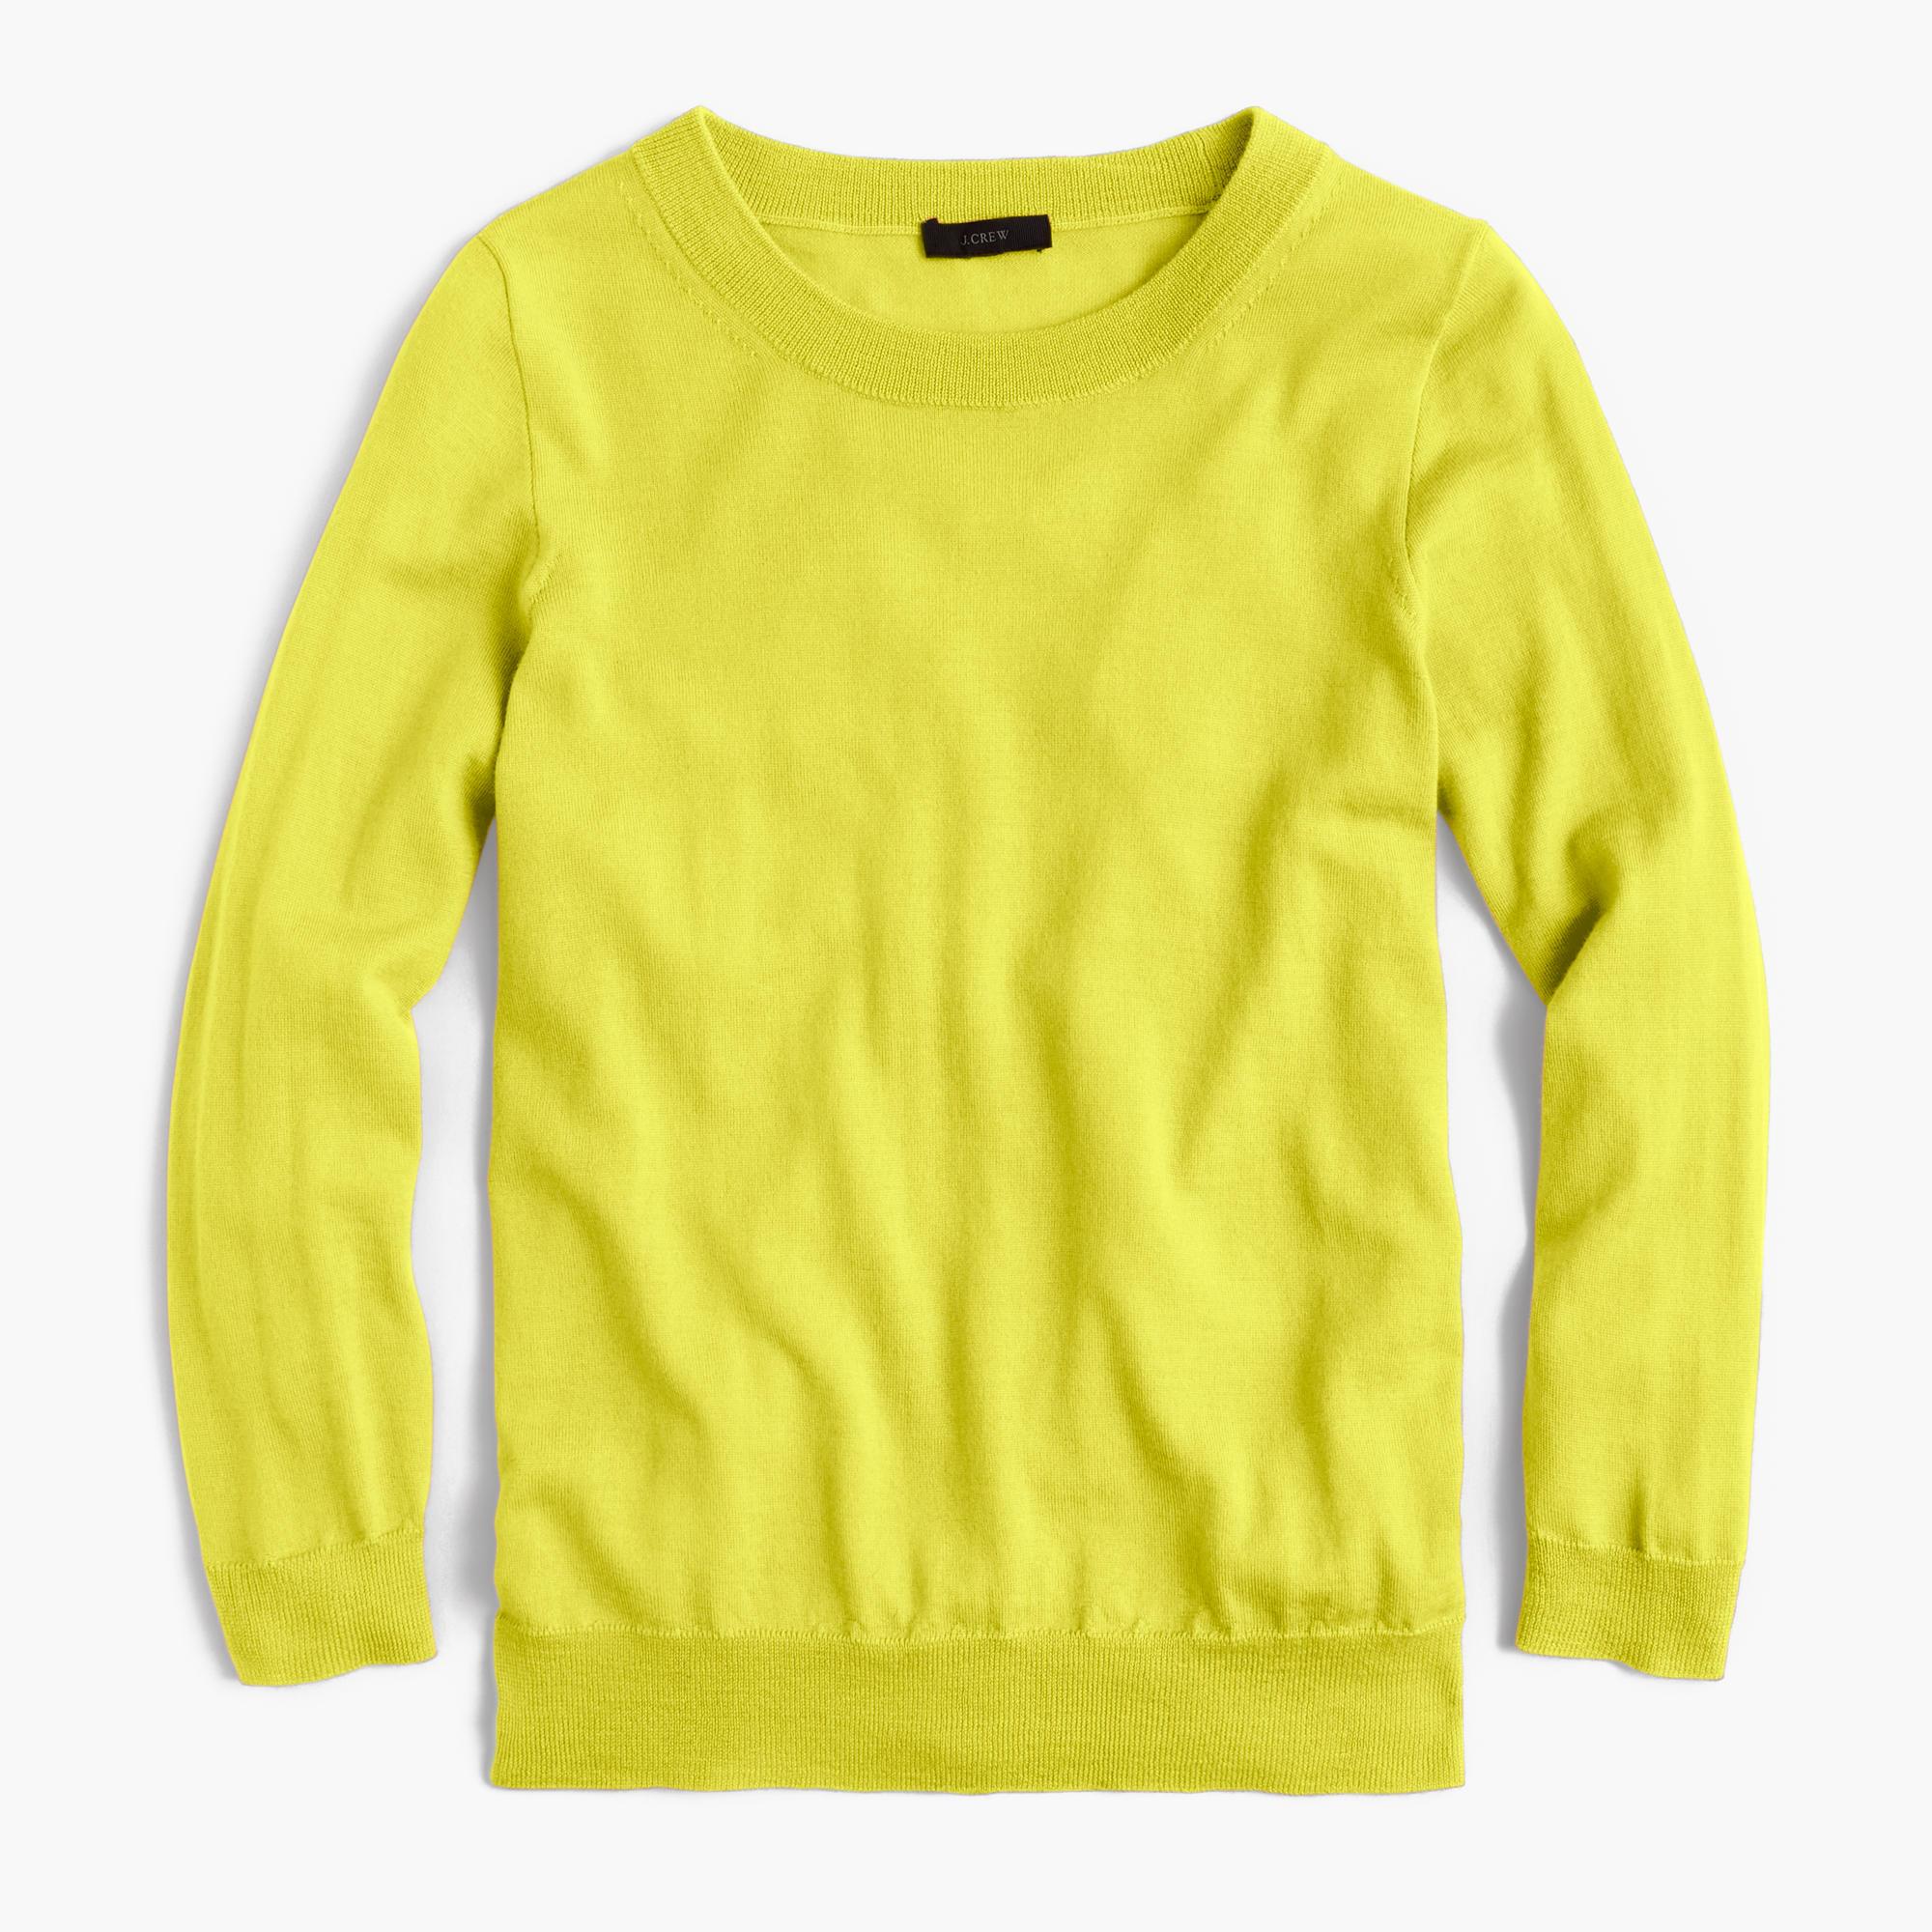 J.crew Tippi Sweater in Yellow | Lyst